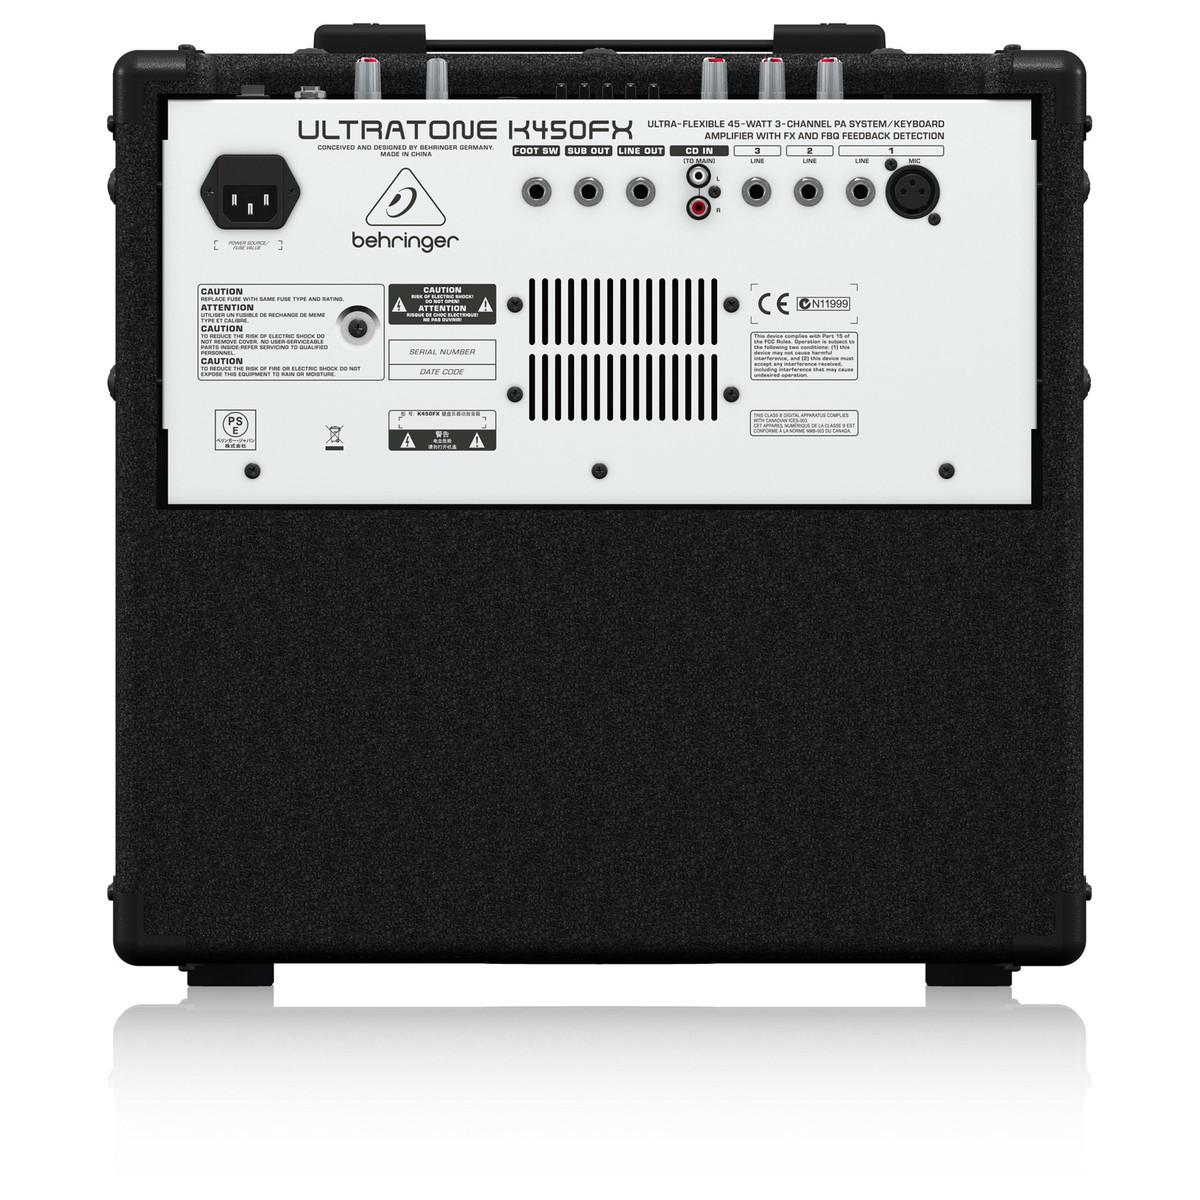 behringer k450fx ultratone keyboard amp b stock at gear4music. Black Bedroom Furniture Sets. Home Design Ideas